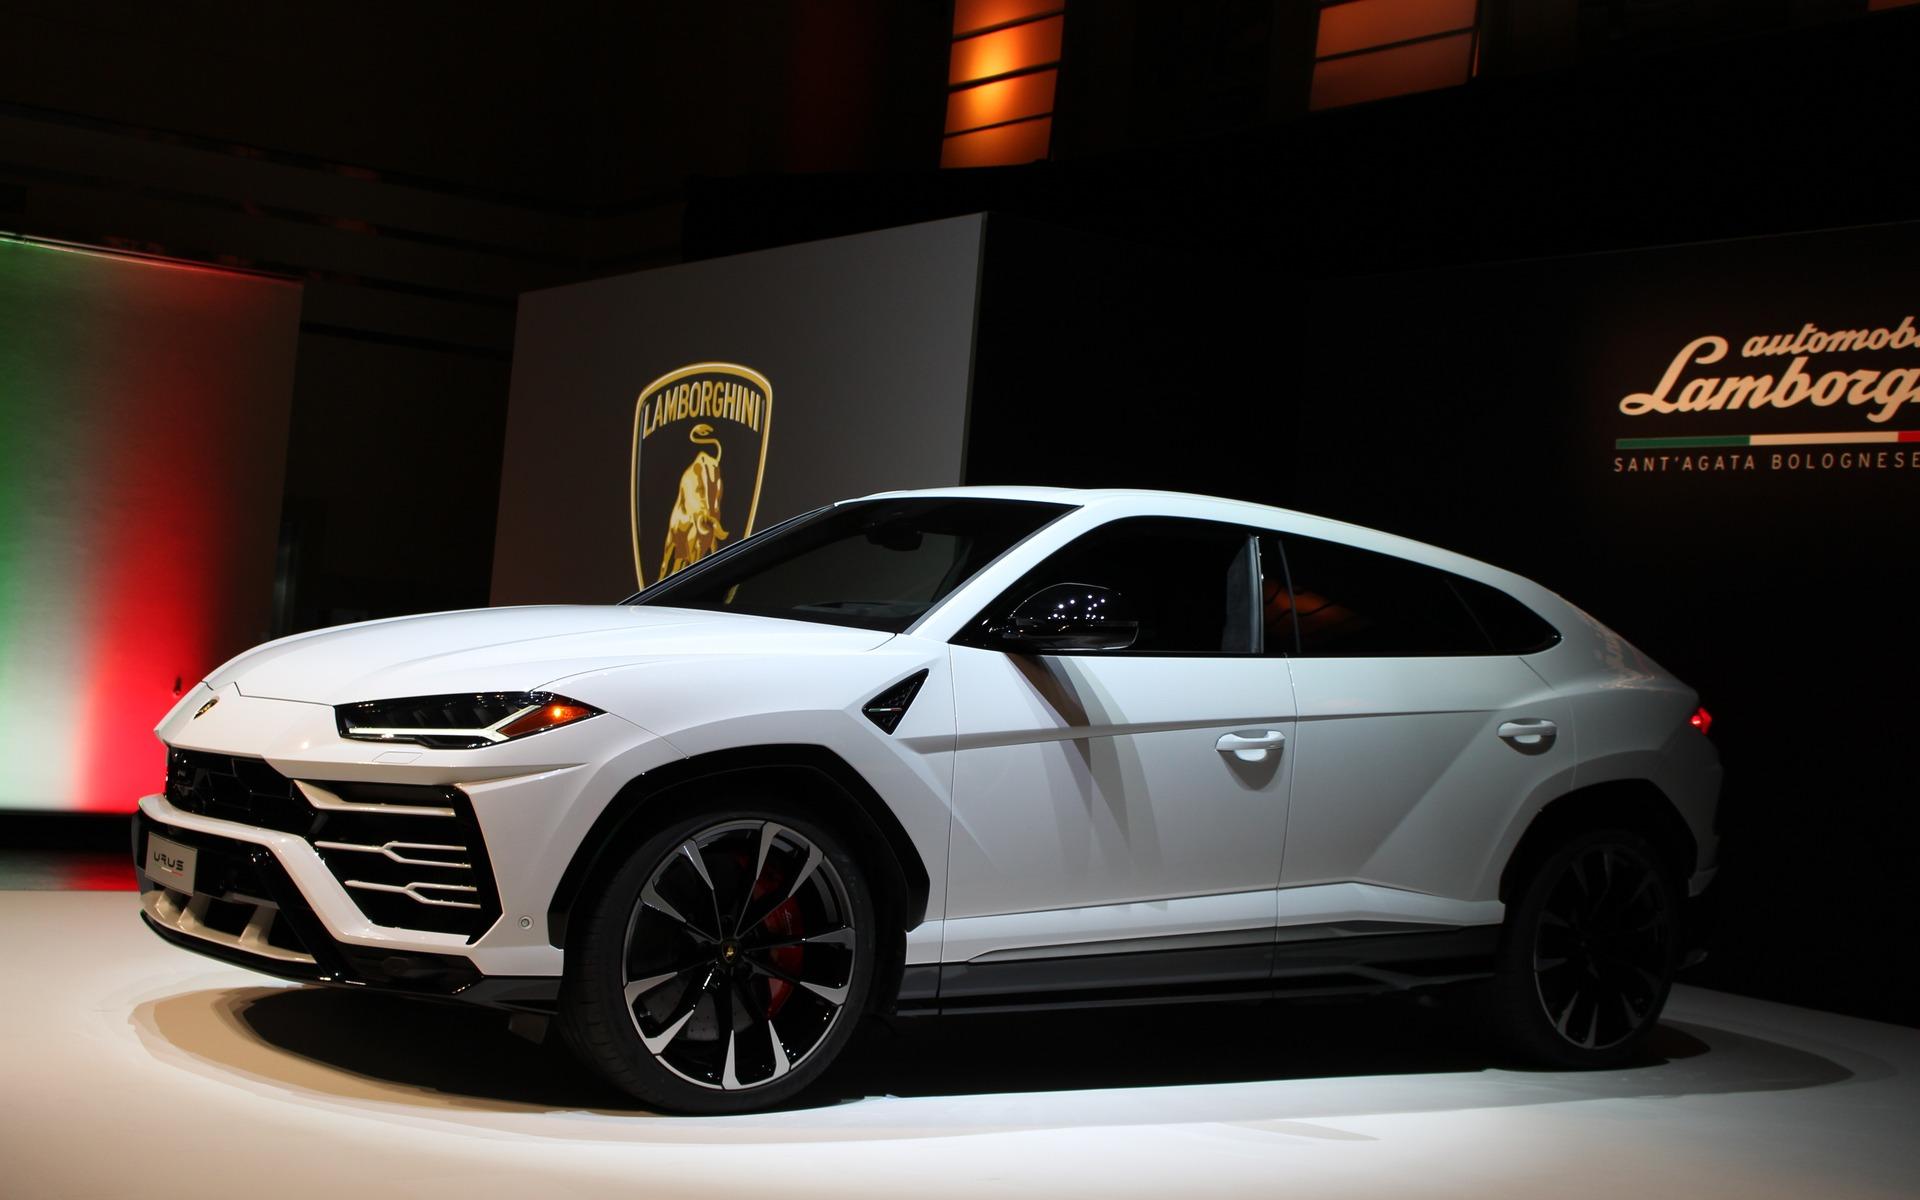 Lamborghini Urus 2019 >> 2019 Lamborghini Urus Preview - 3/17